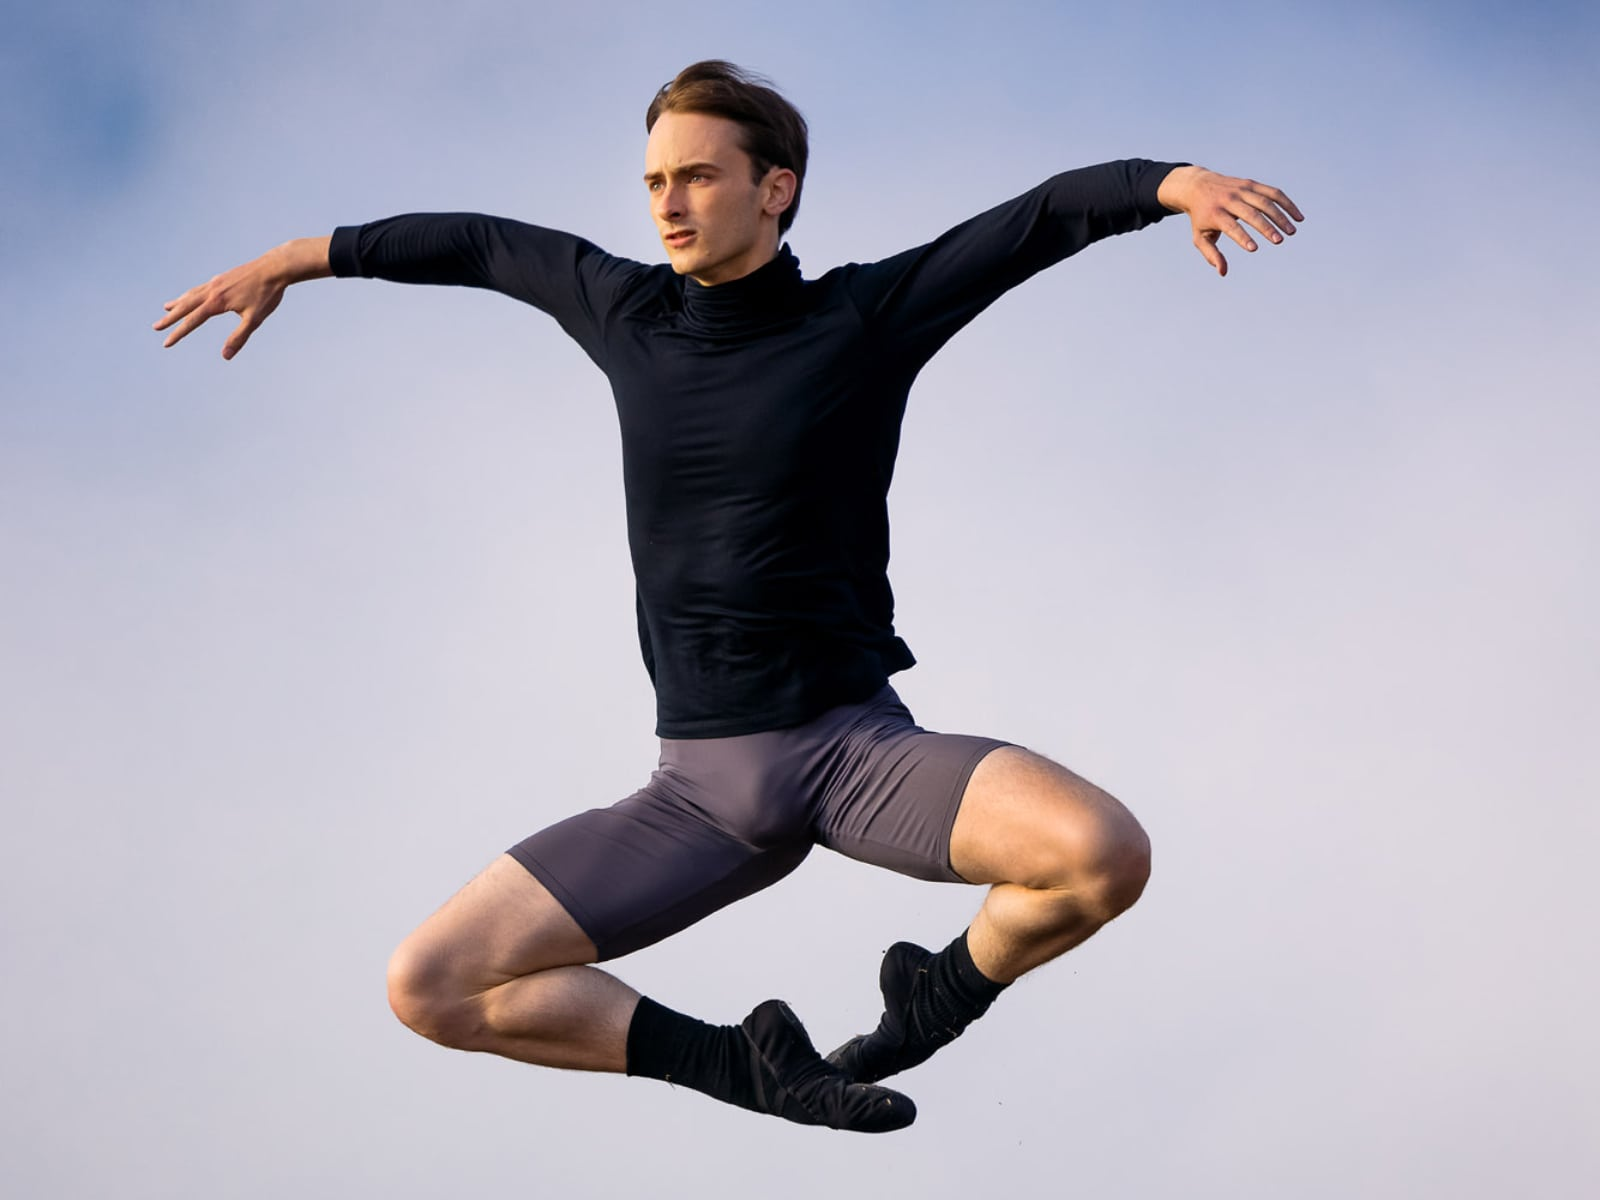 Yuri jumping. Photo By Chris Hardy